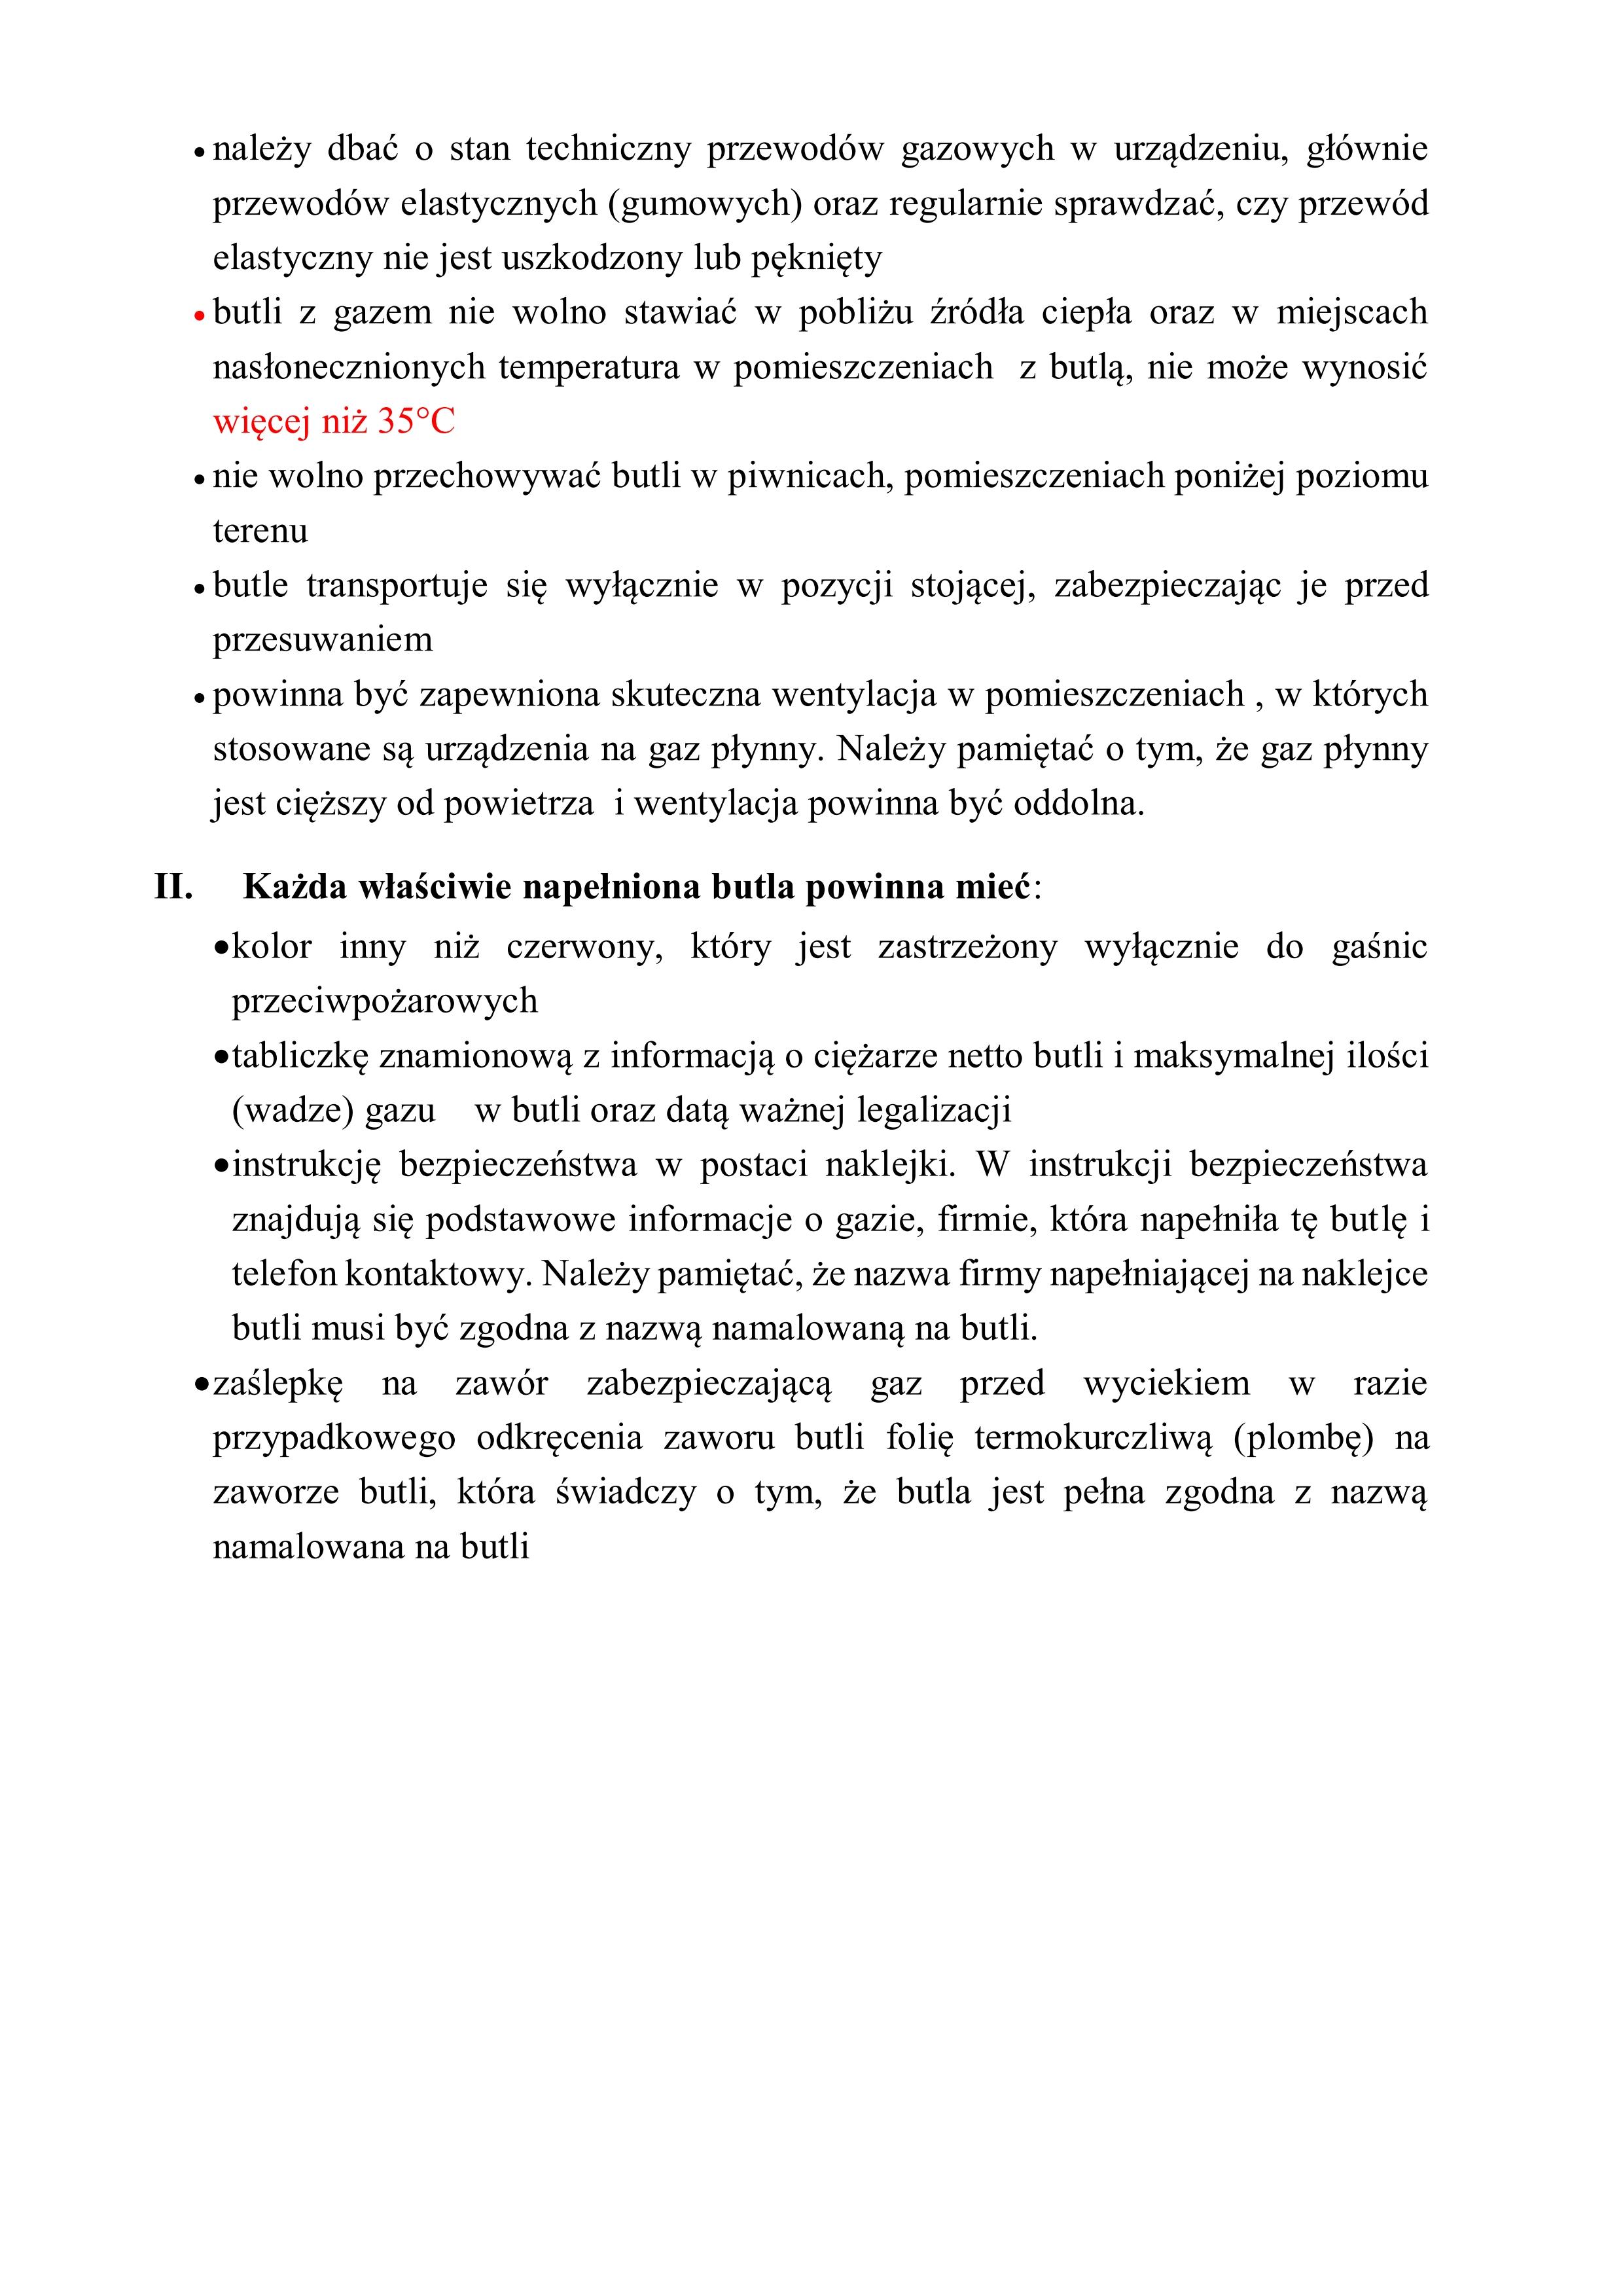 19_informacja_butle_gazowe_01